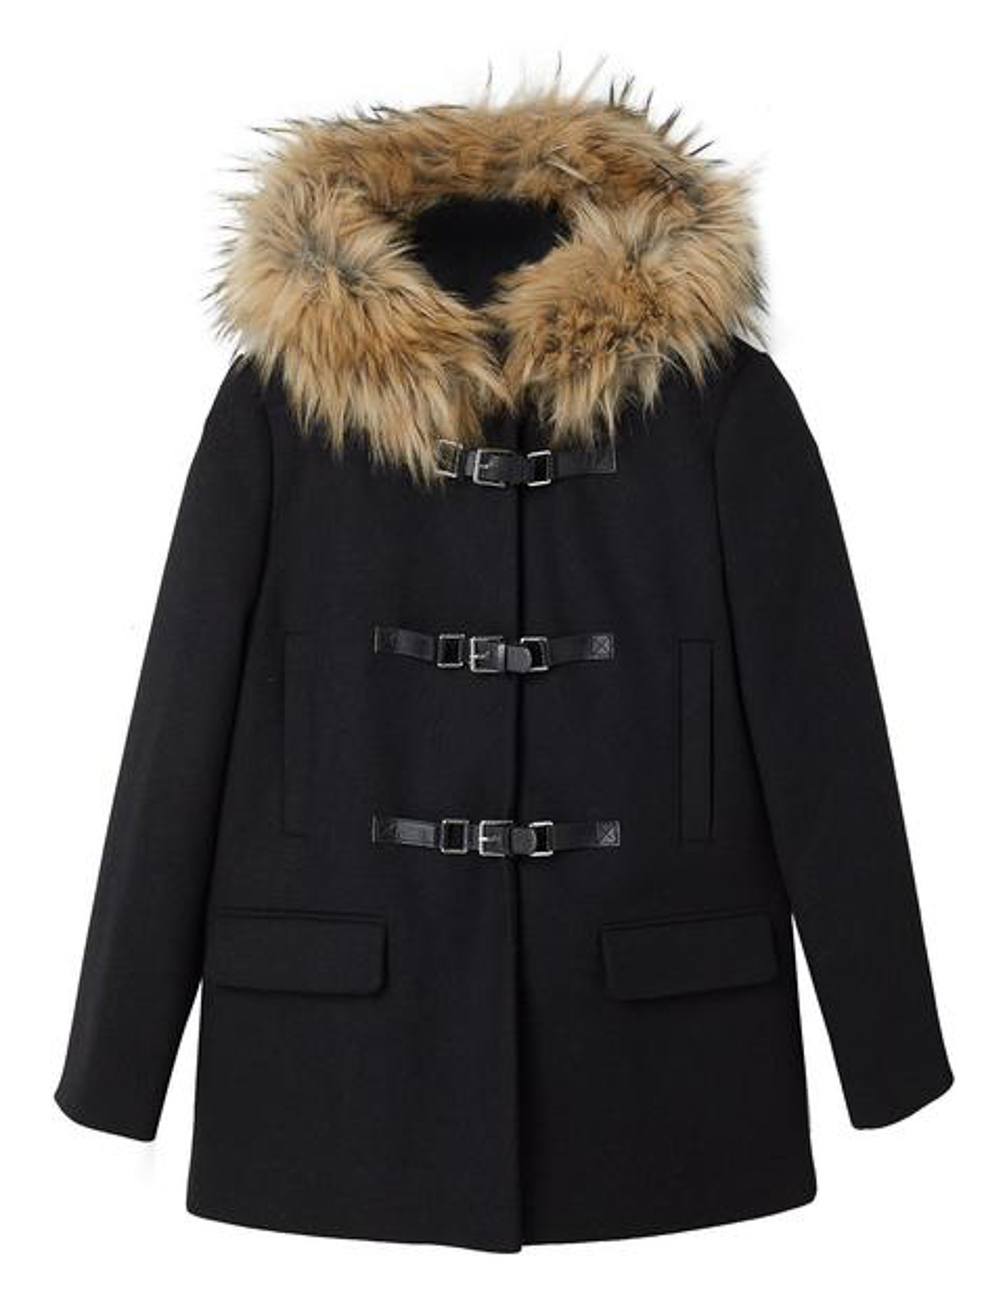 Пальто Stradivarius Ж1052149 (5874/133/001) цвет черный